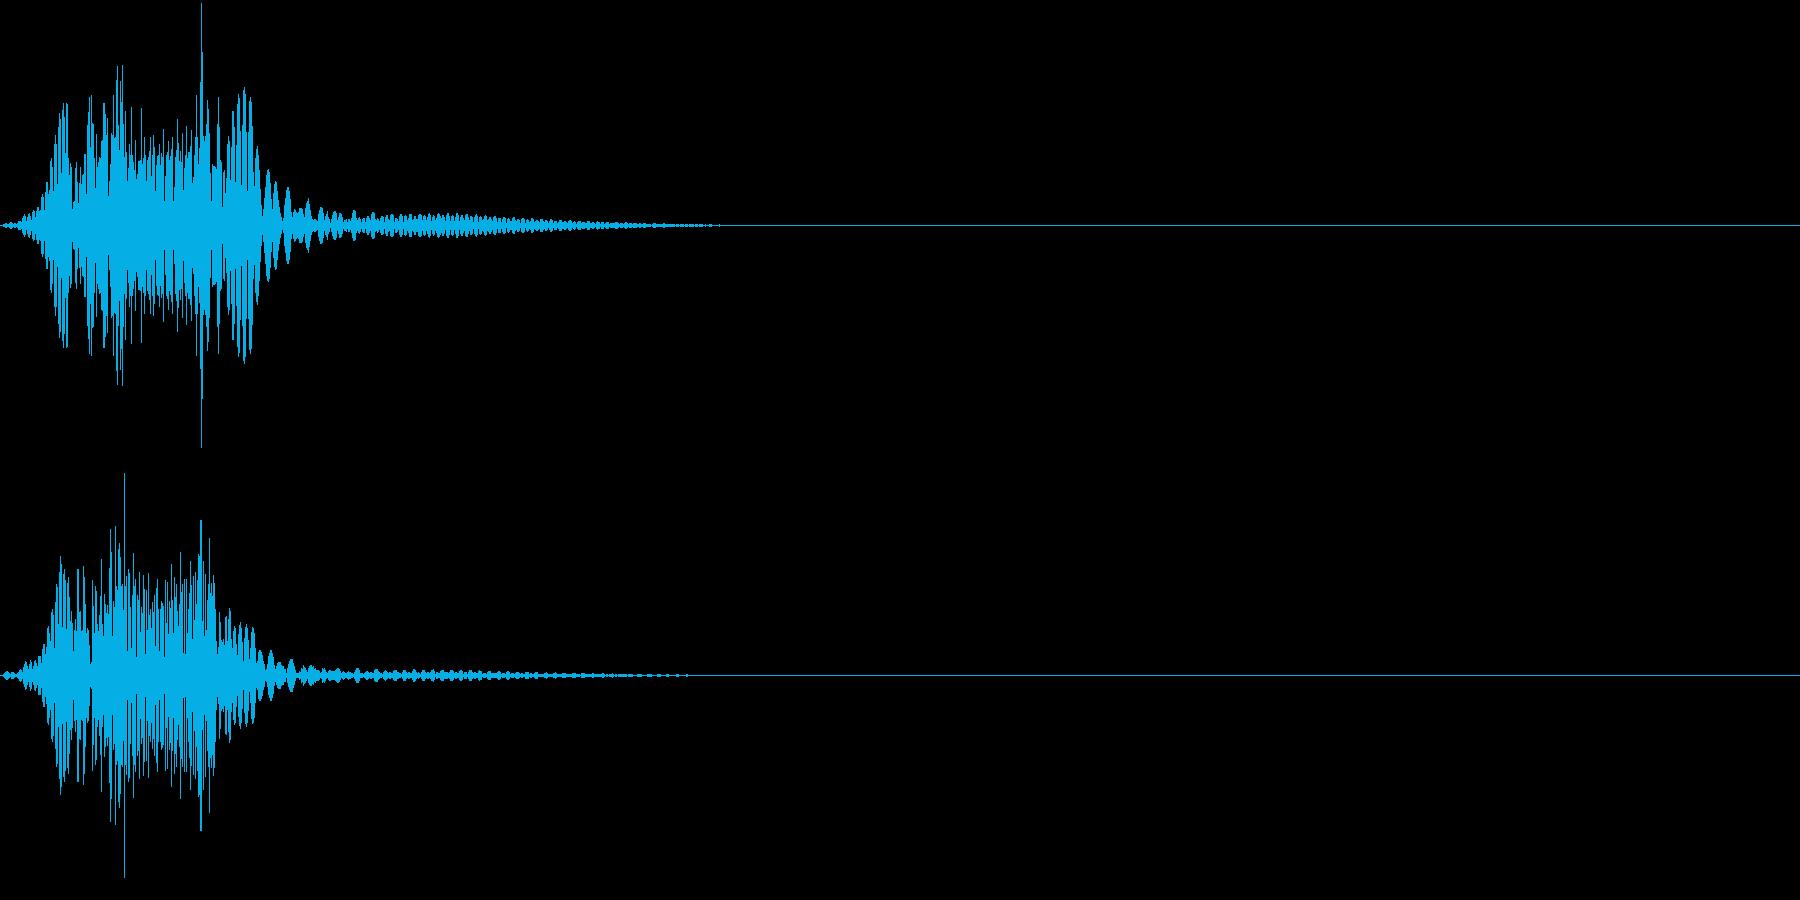 Push 汎用決定・セレクト音 1の再生済みの波形